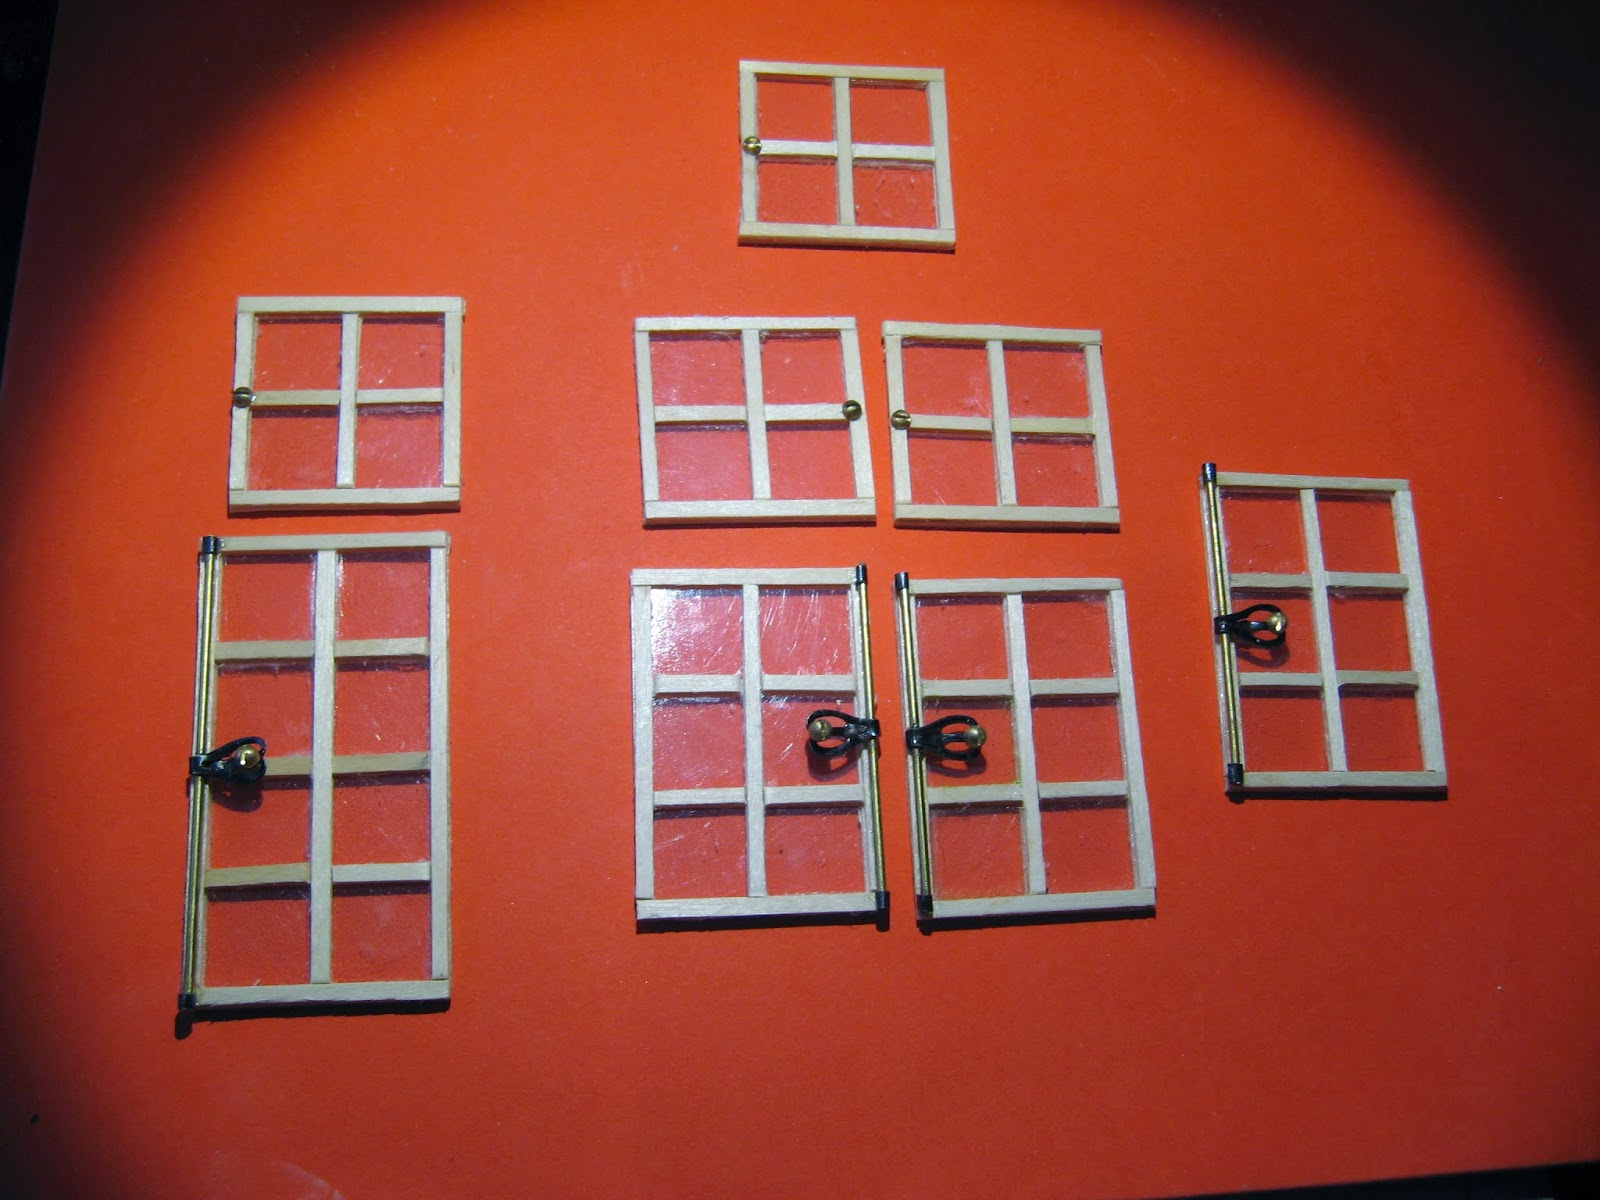 maf miniatures faire une fen tre. Black Bedroom Furniture Sets. Home Design Ideas